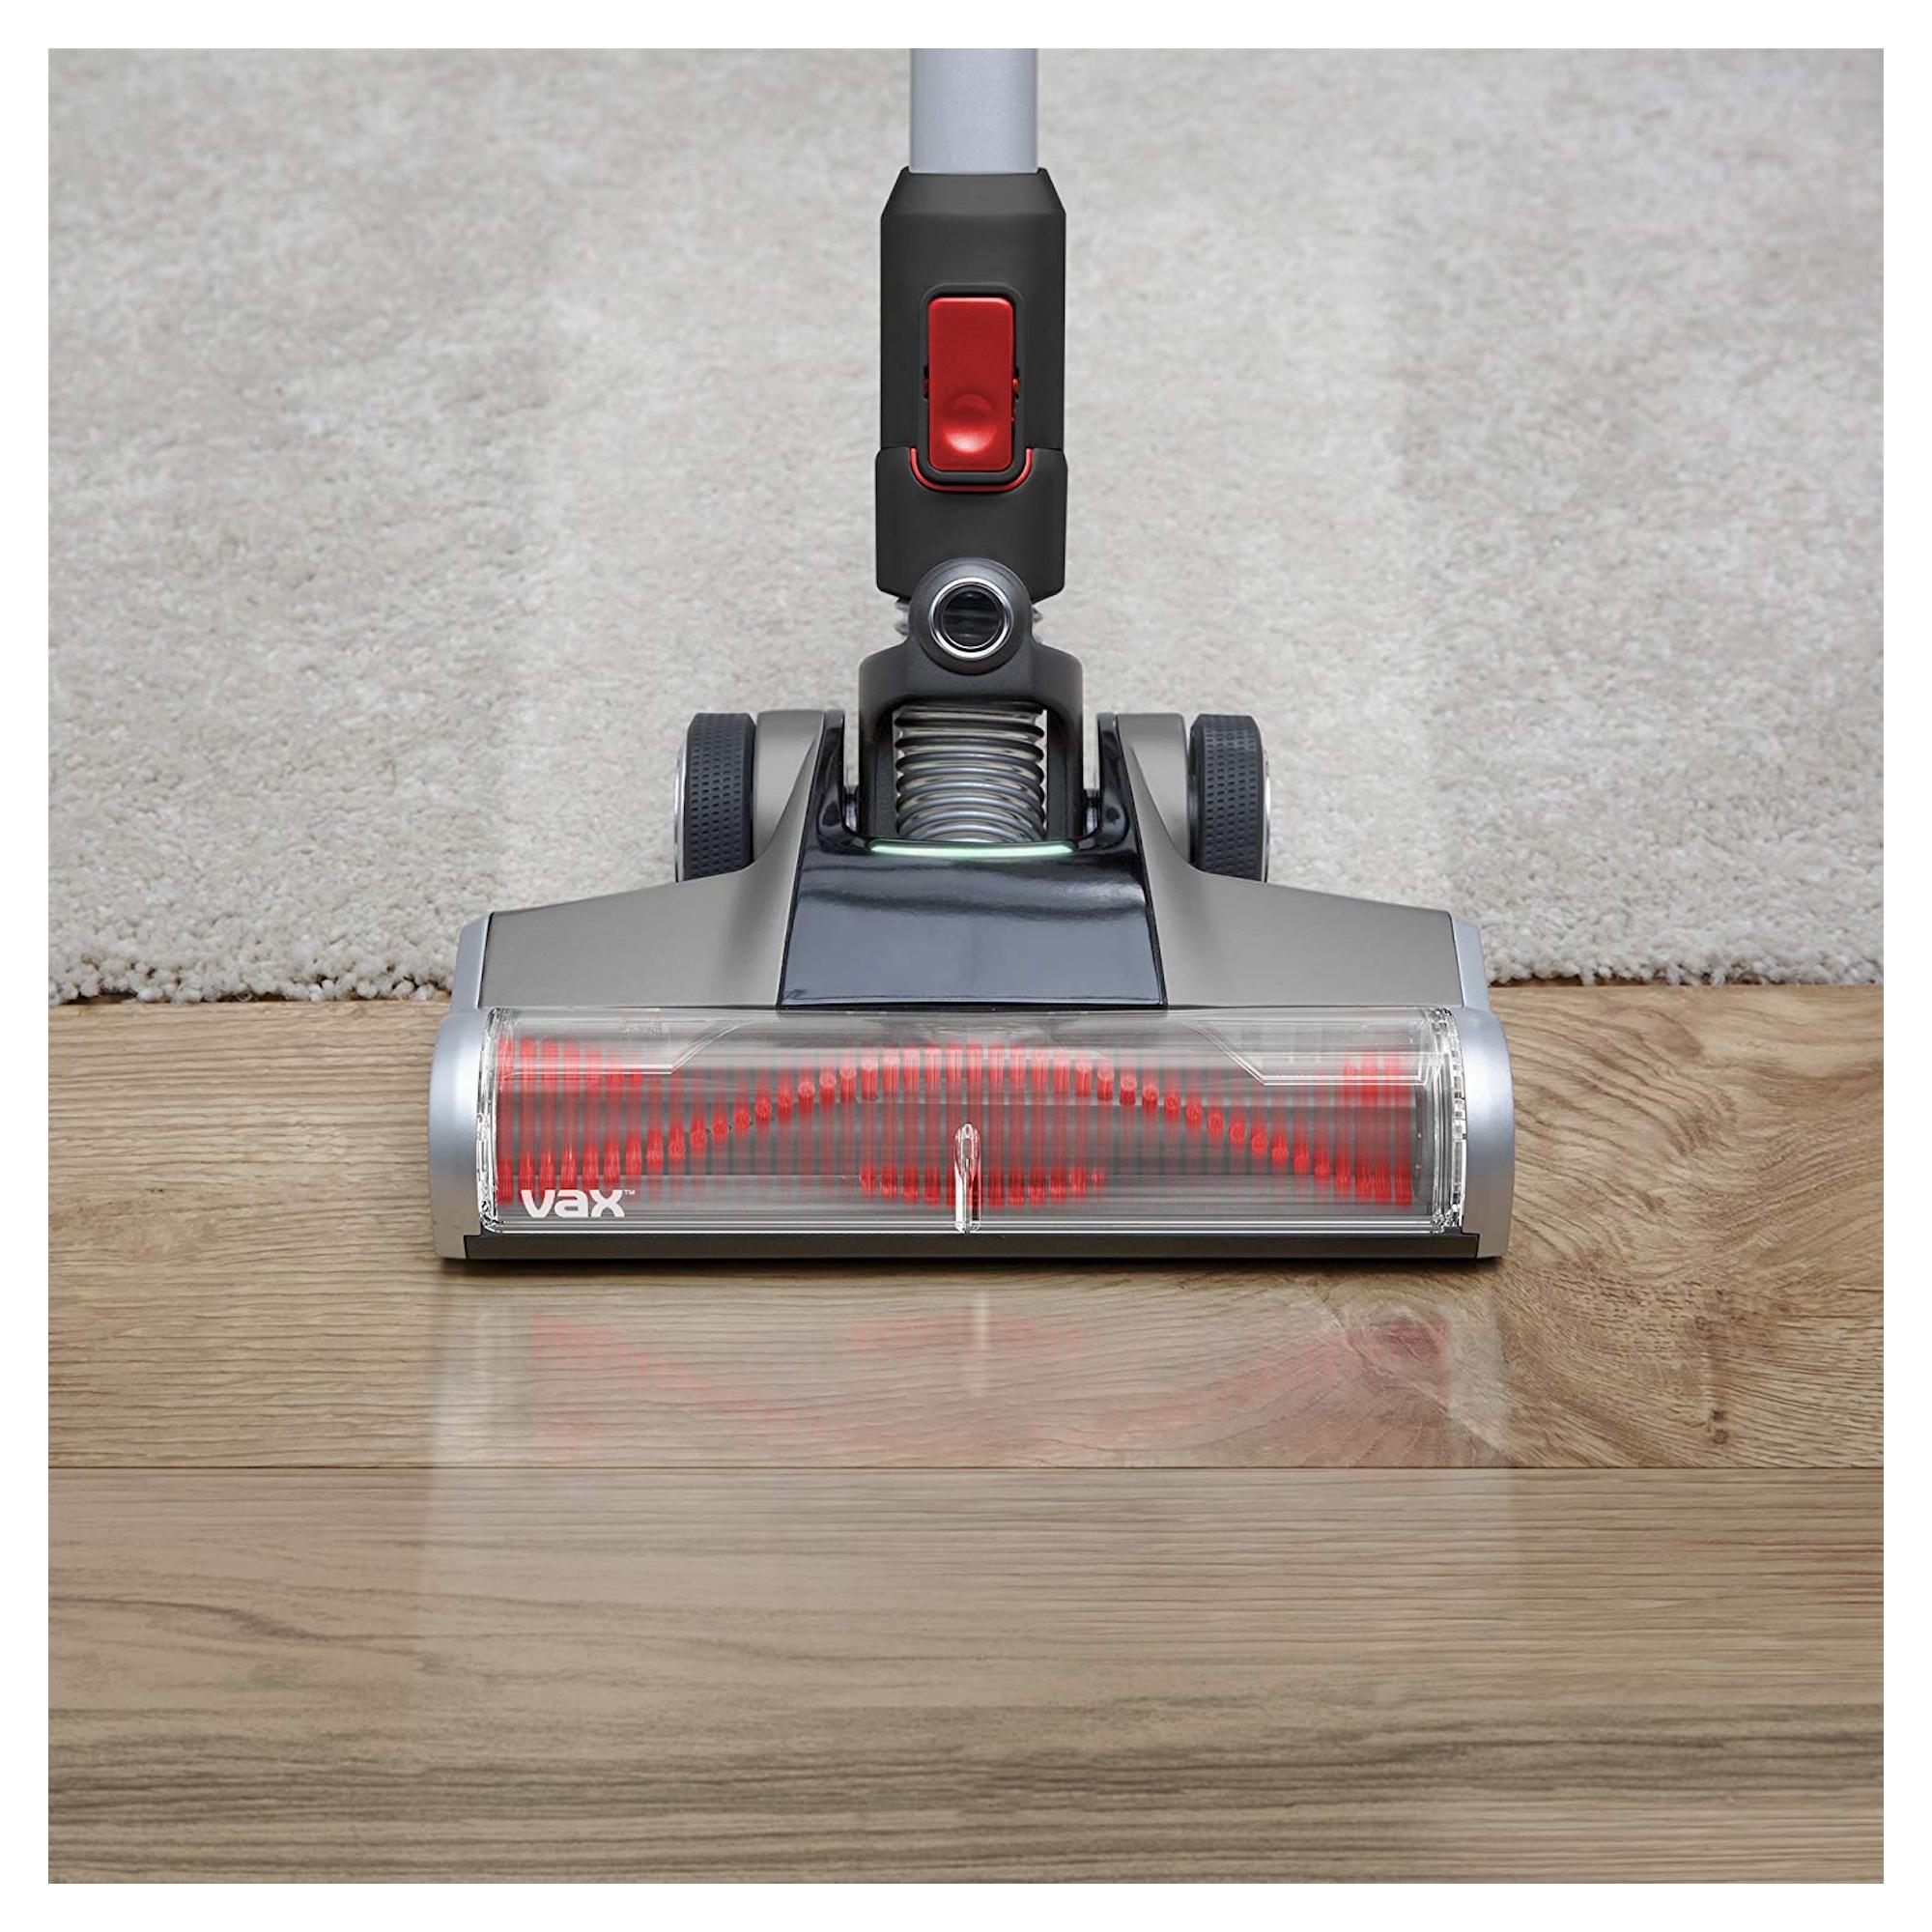 32 V 150 W Vax TBT3V1P2 Blade Ultra Stick Vacuum